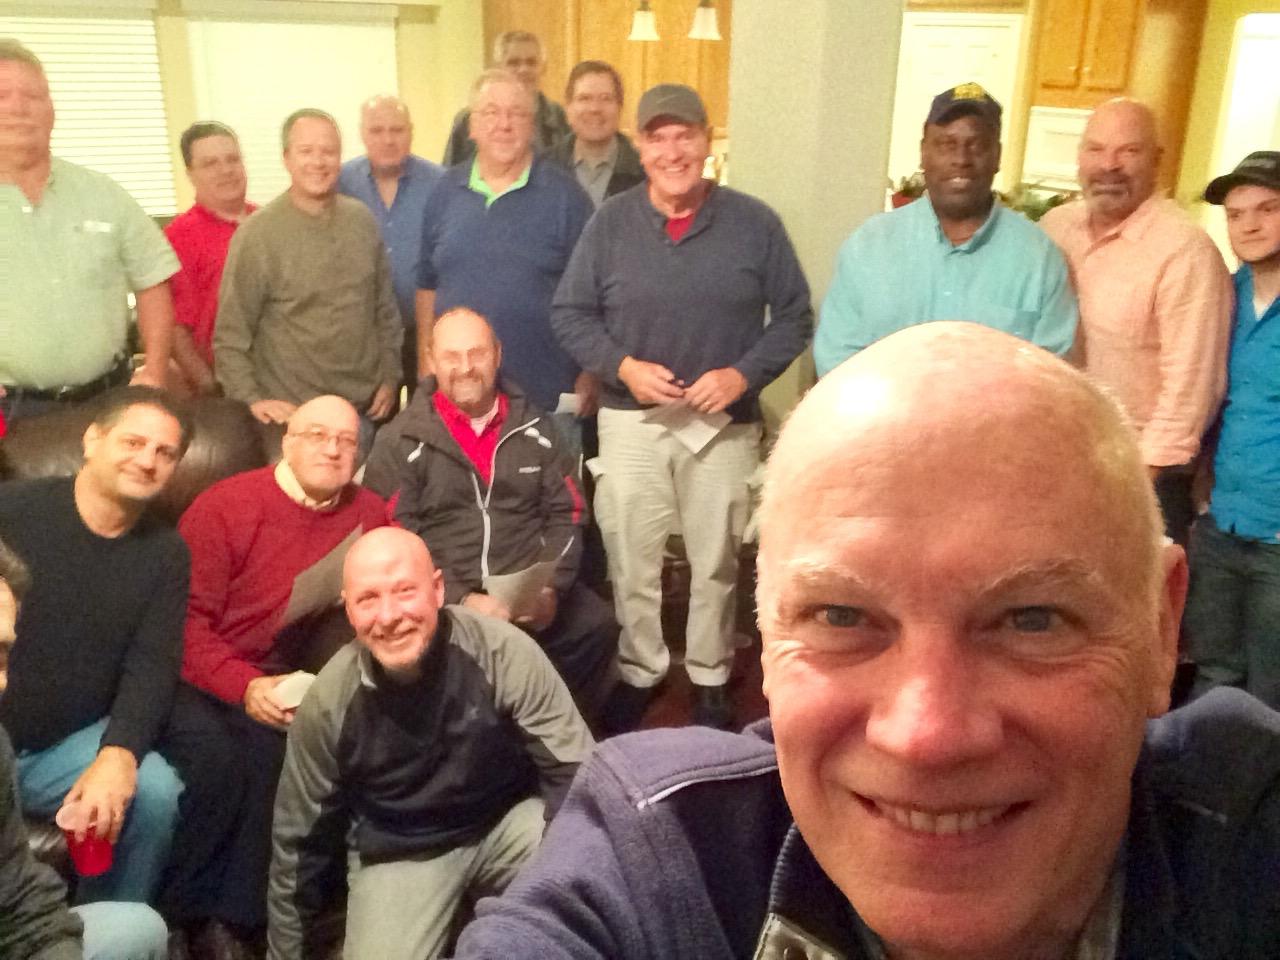 Men's Small Group, 2nd Baptist Church, Houston, TX